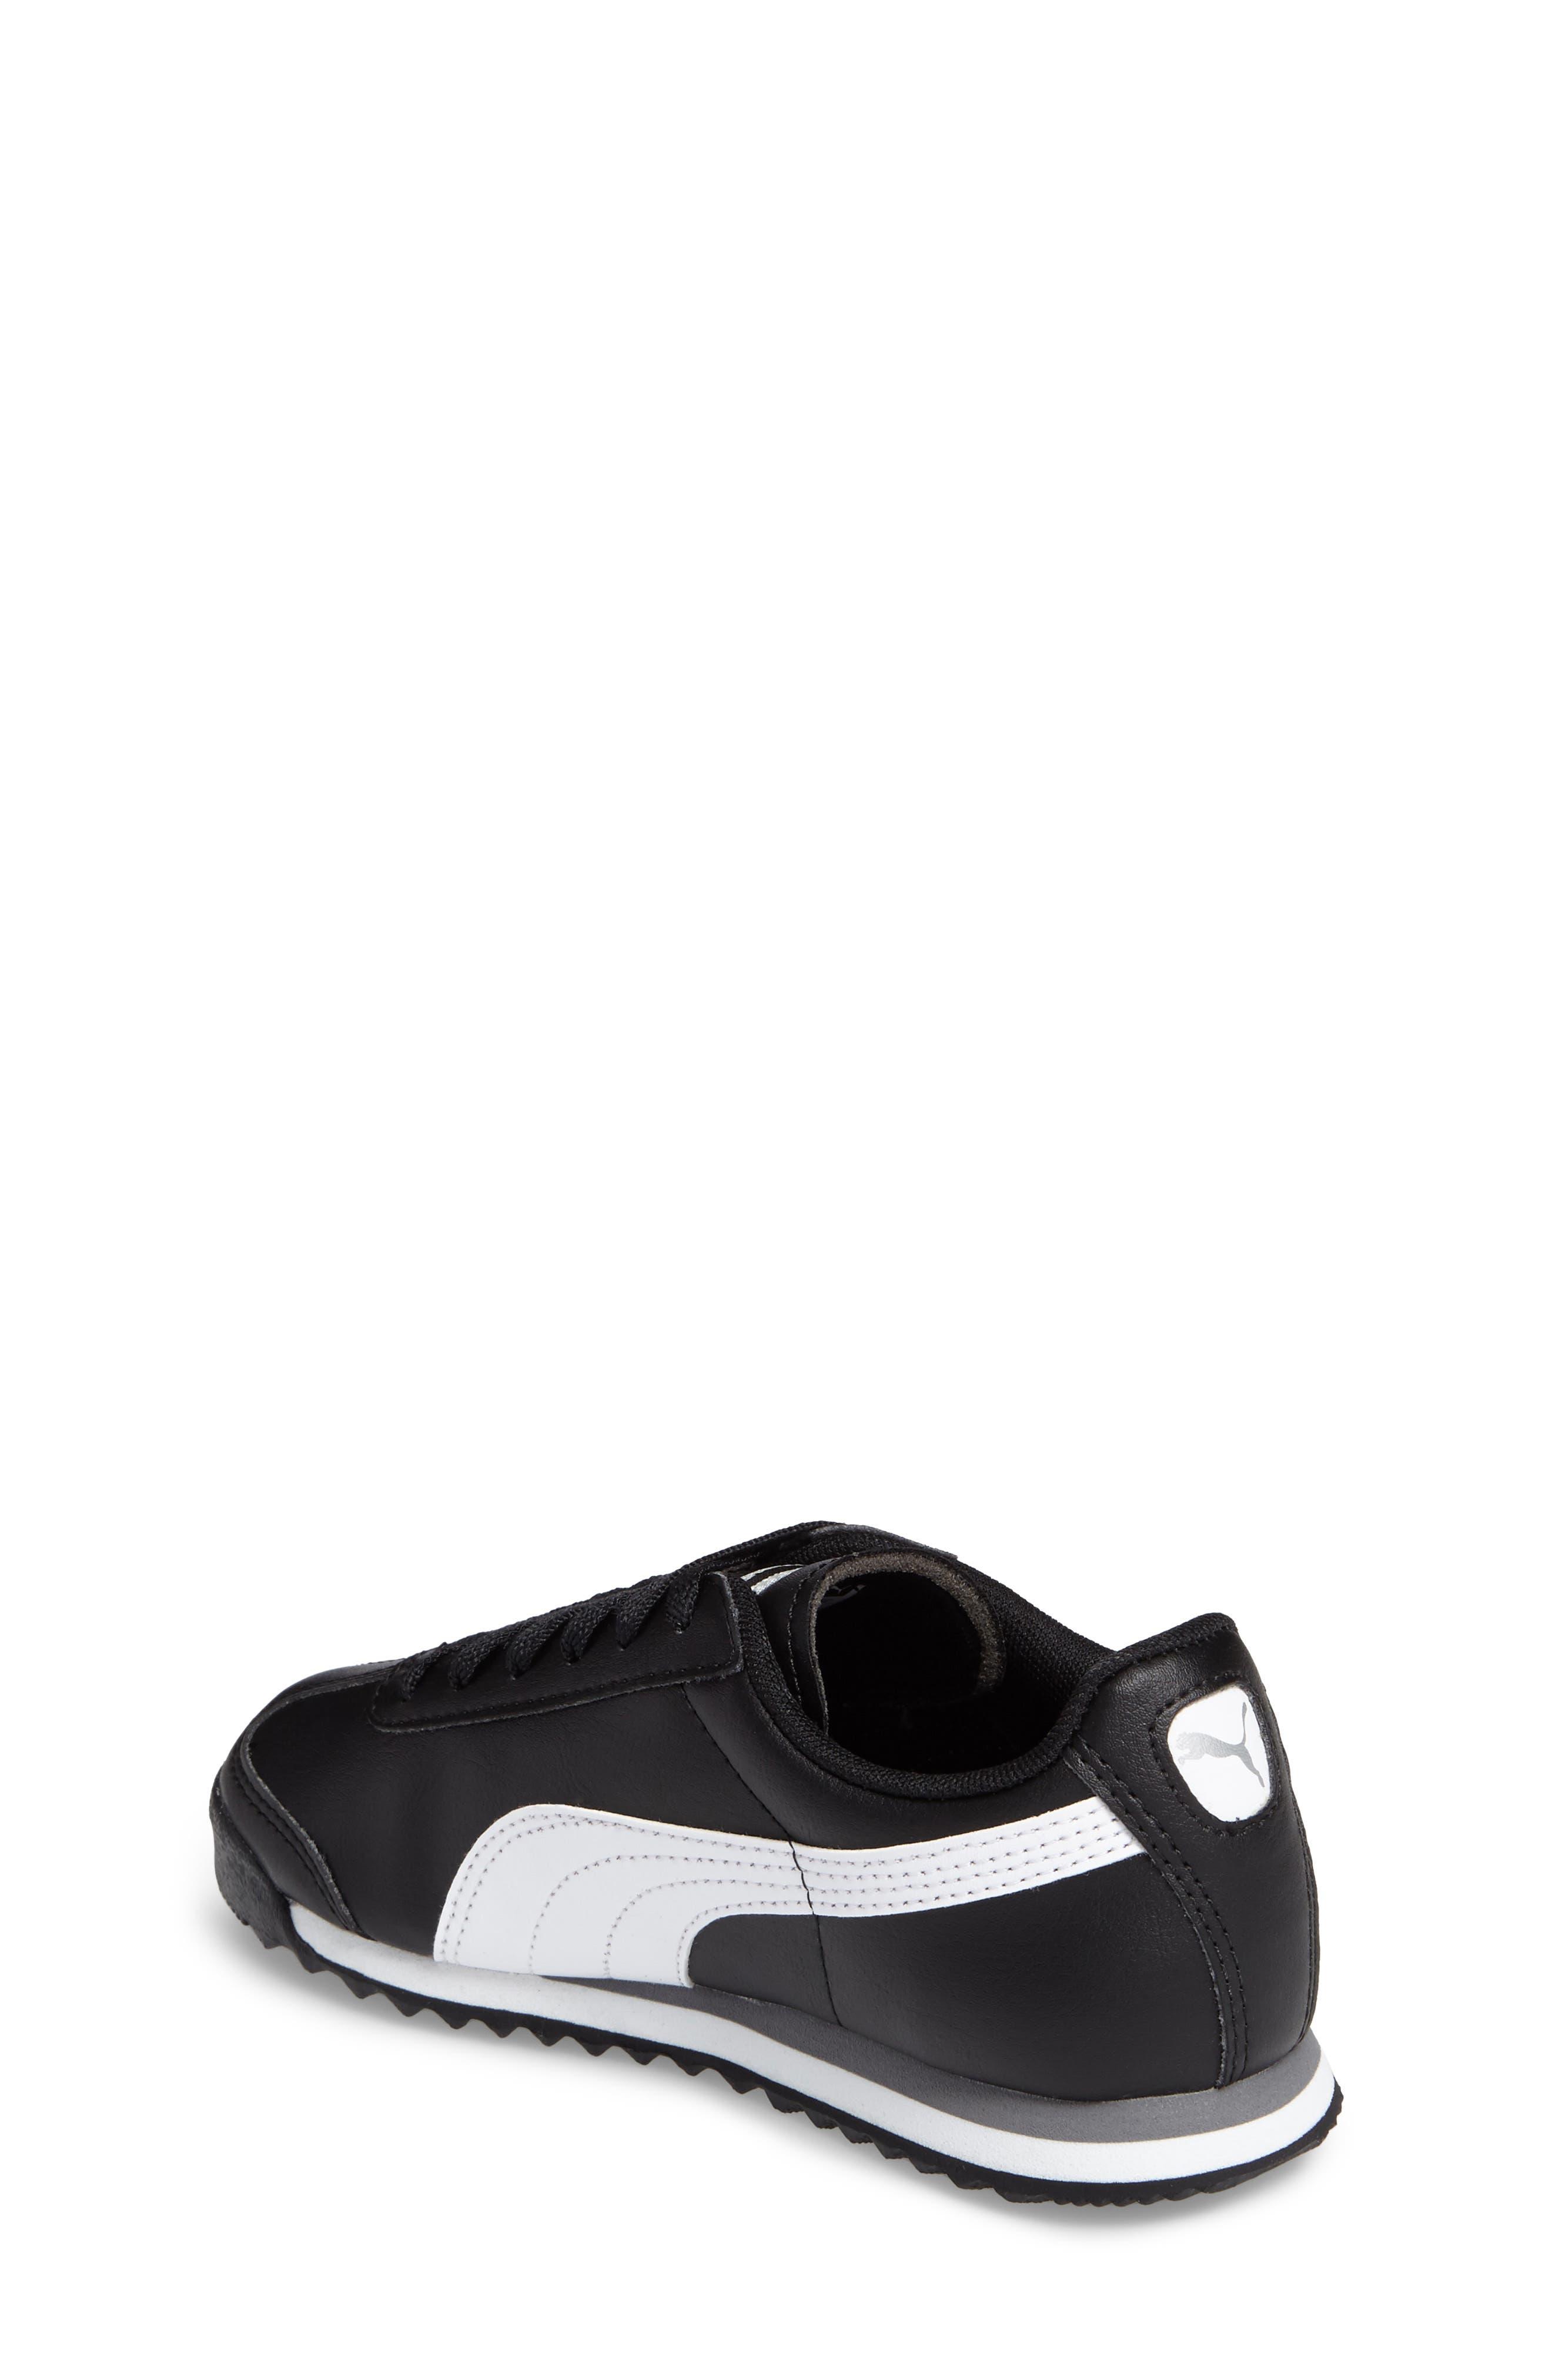 Alternate Image 2  - PUMA Roma Basic Sneaker (Toddler, Little Kid & Big Kid)